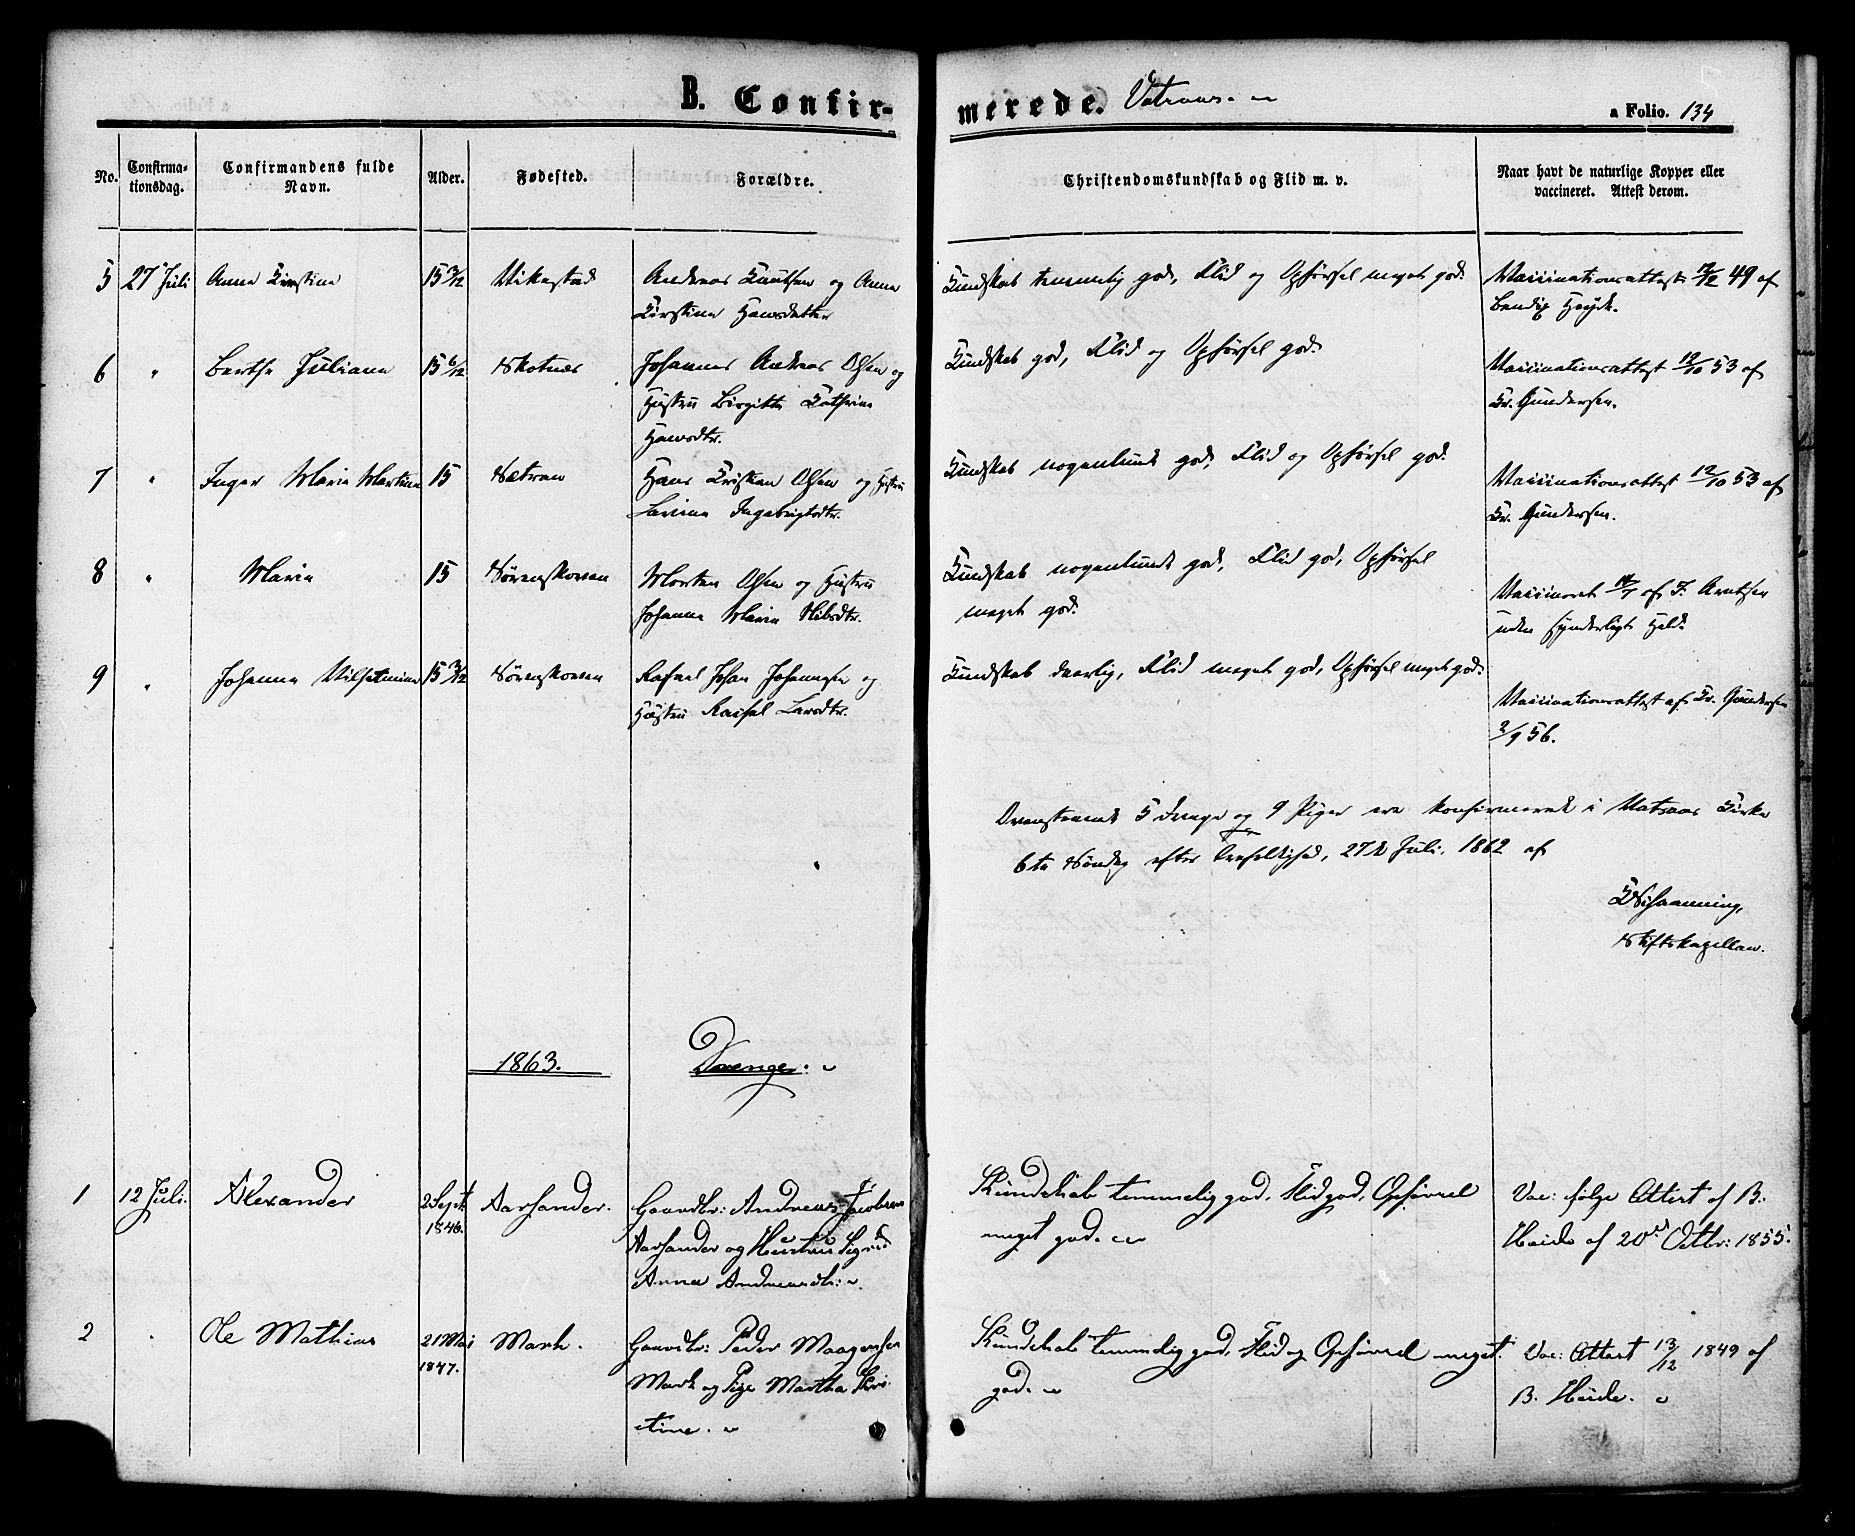 SAT, Ministerialprotokoller, klokkerbøker og fødselsregistre - Nordland, 810/L0146: Ministerialbok nr. 810A08 /1, 1862-1874, s. 134